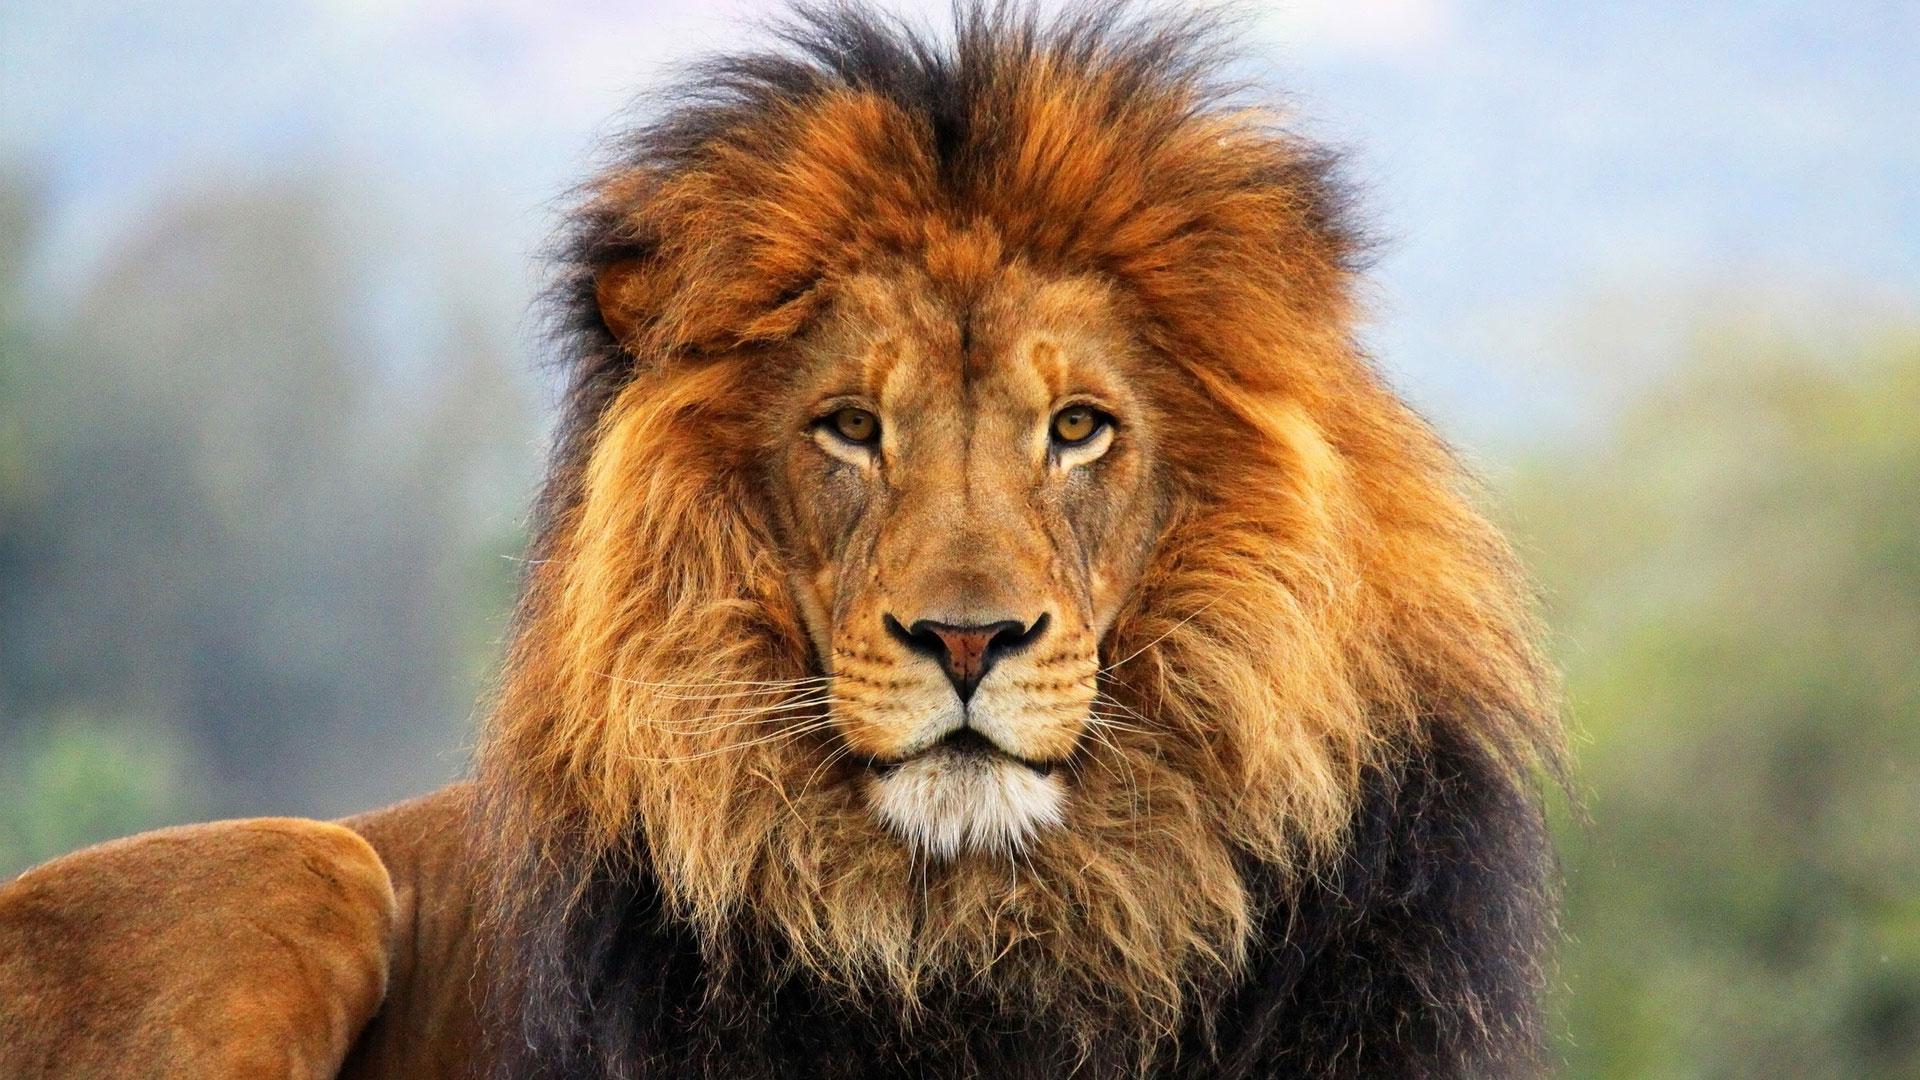 wallpaper : face, eyes, lion, fur, mane 1920x1080 - - 1024123 - hd